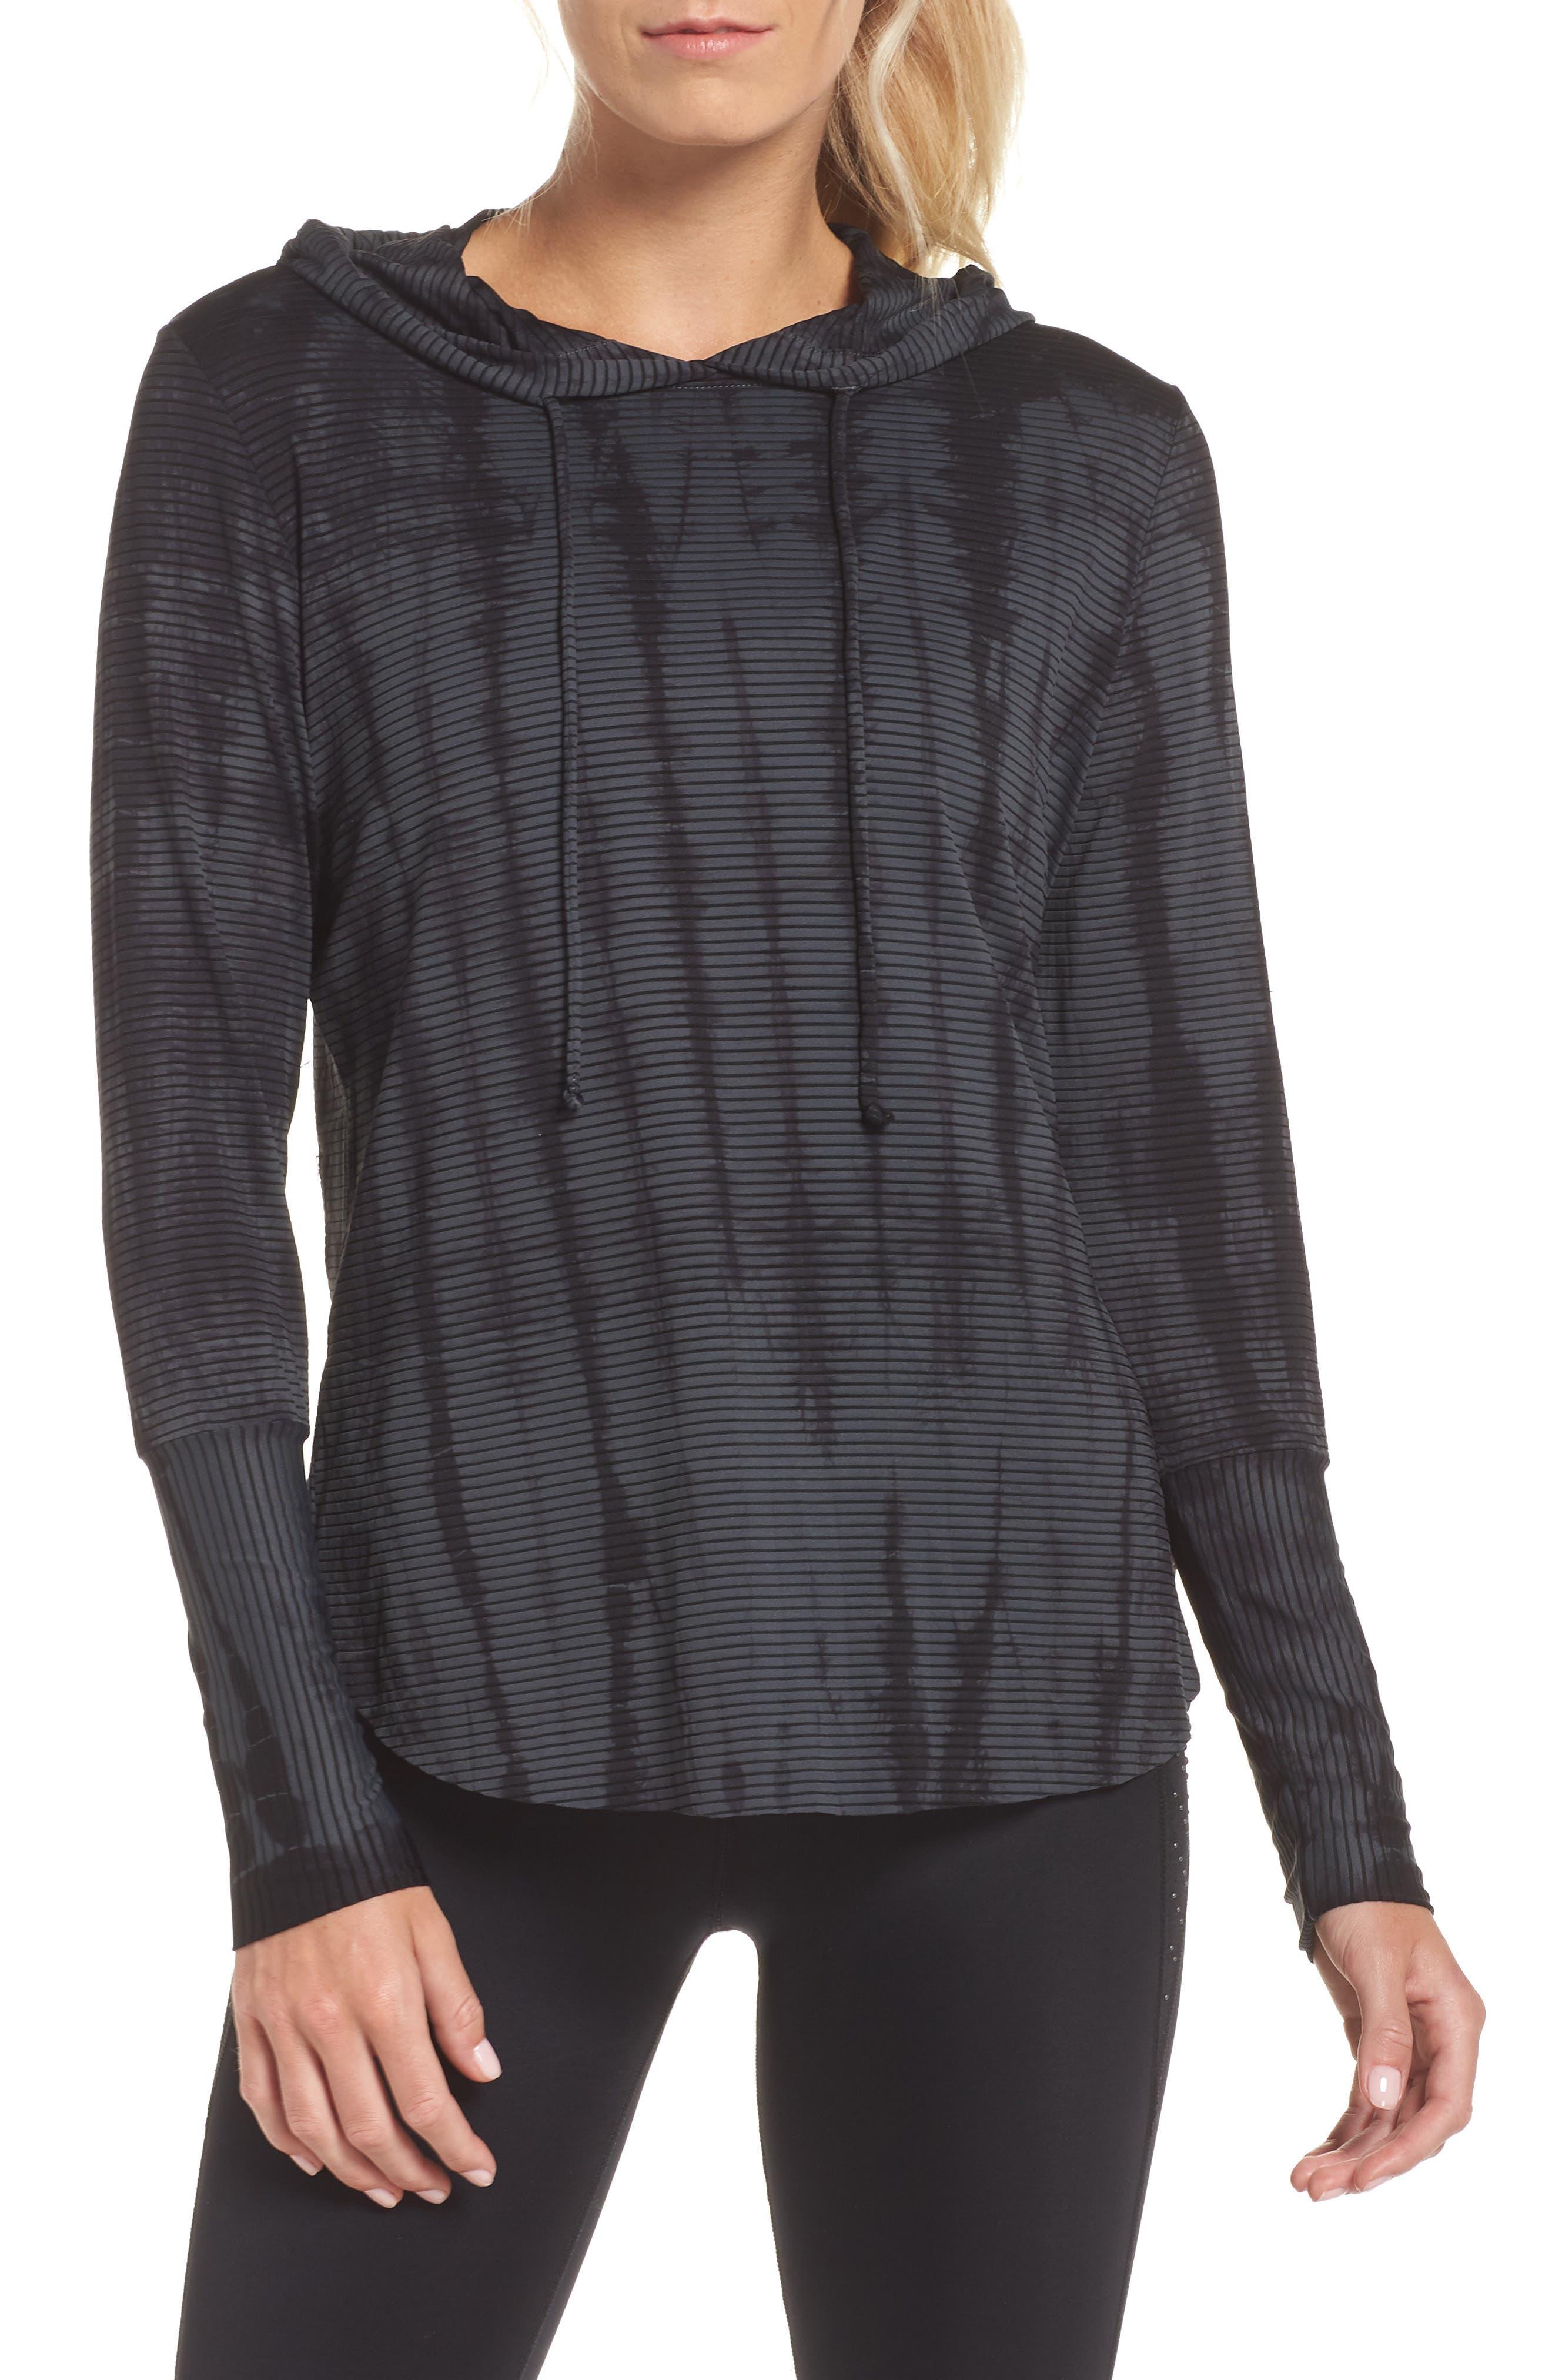 Waves Tie Dye Gray Hooded Pullover,                             Main thumbnail 1, color,                             DARK GREY